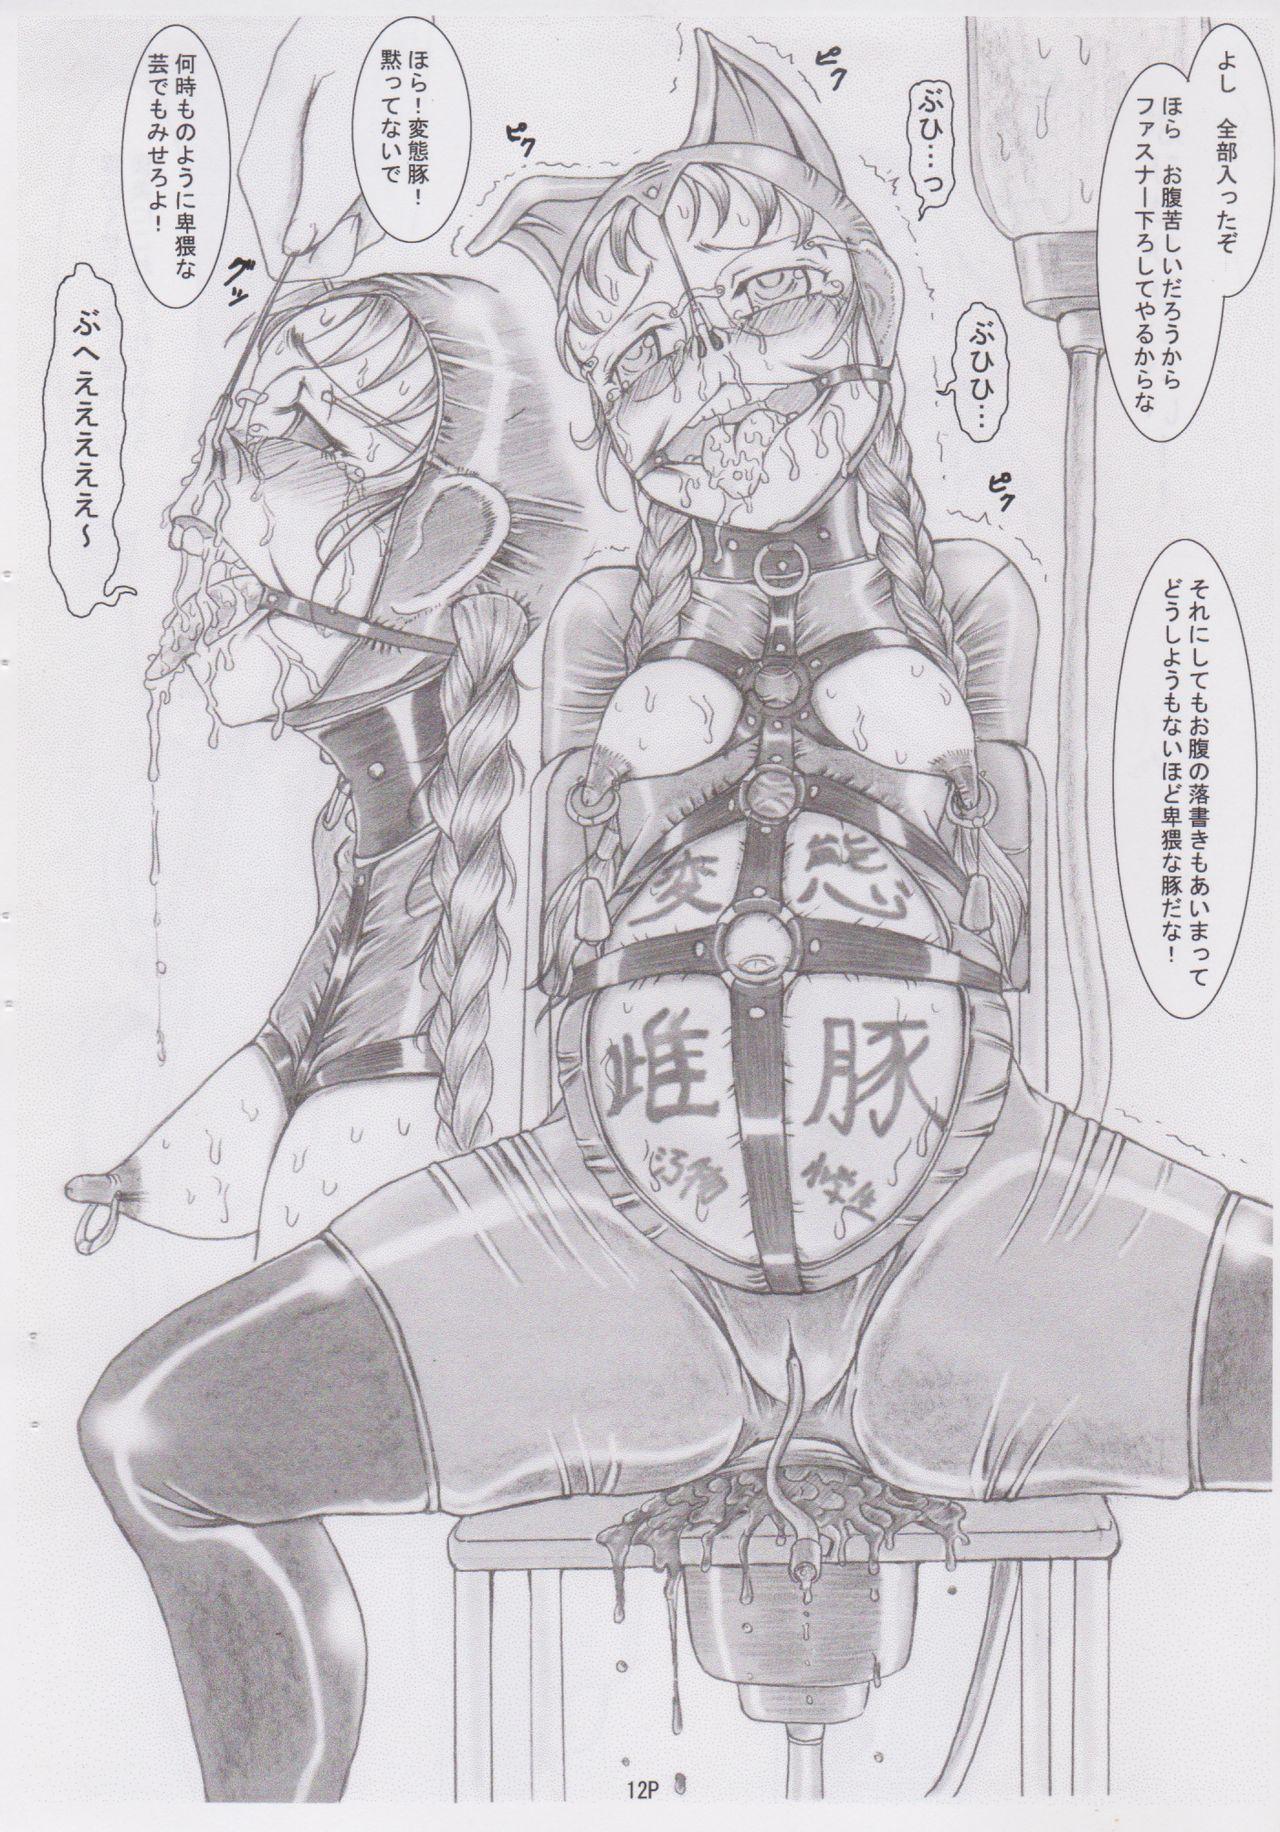 (C78) [Nekoneko Panchu! (Nekoneko Panchu)] Sanshimai Choukyou Yuugi [Yukari Hen] Yukari-chan no Butabana Kachiku Choukyou [Anal Higyaku Jugyou] 11